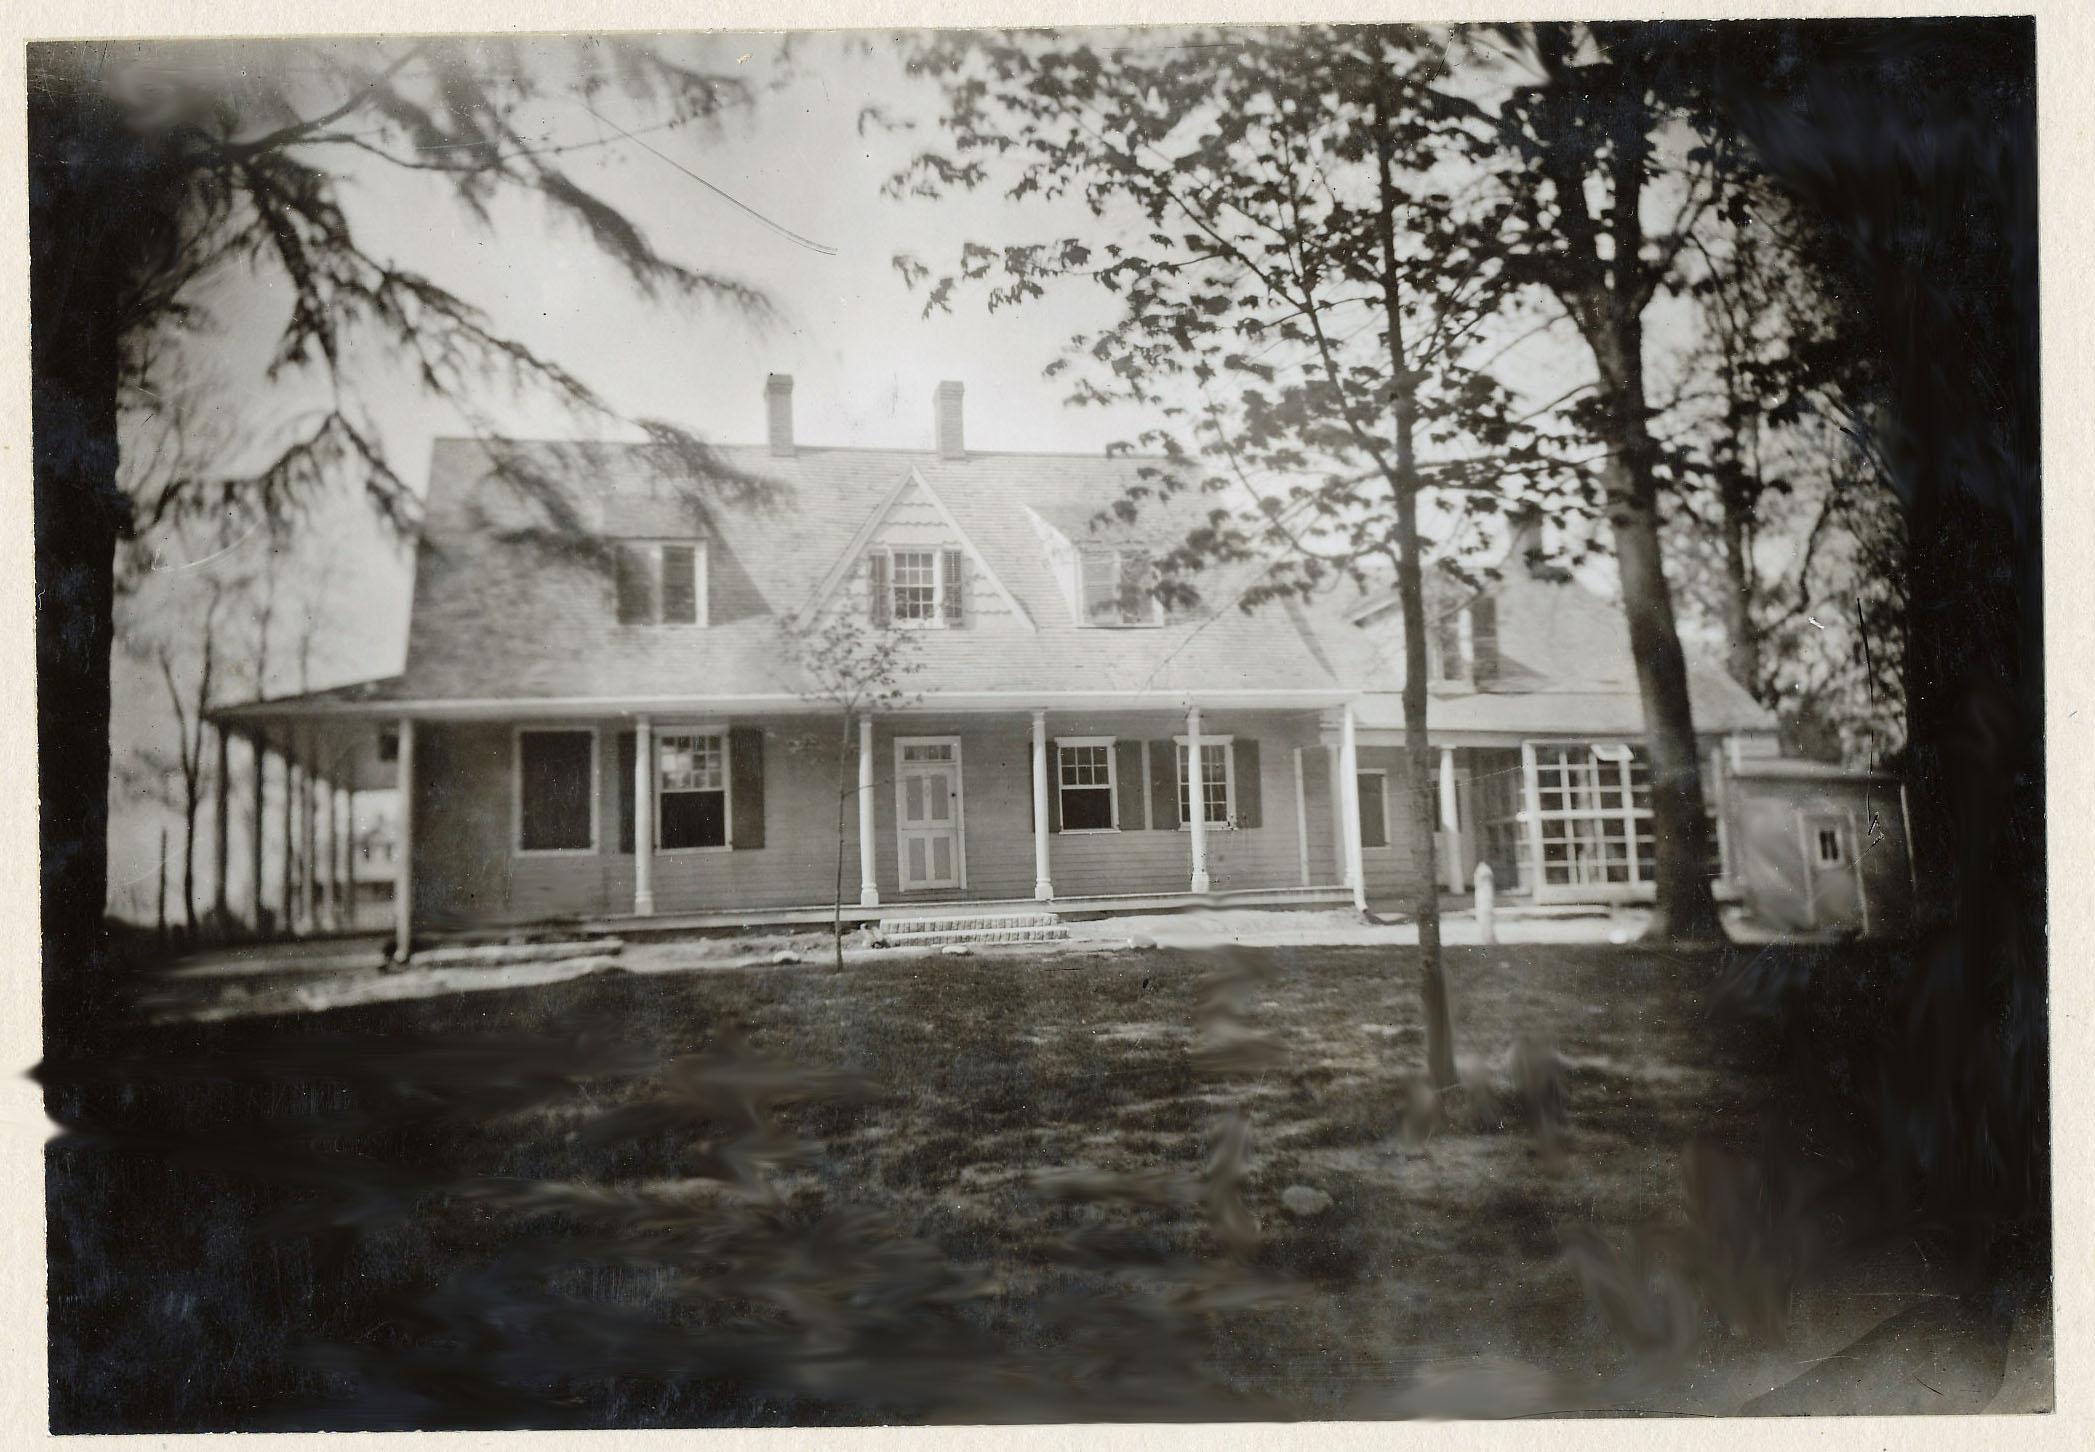 The Bates homestead, the original house was built circa 1732